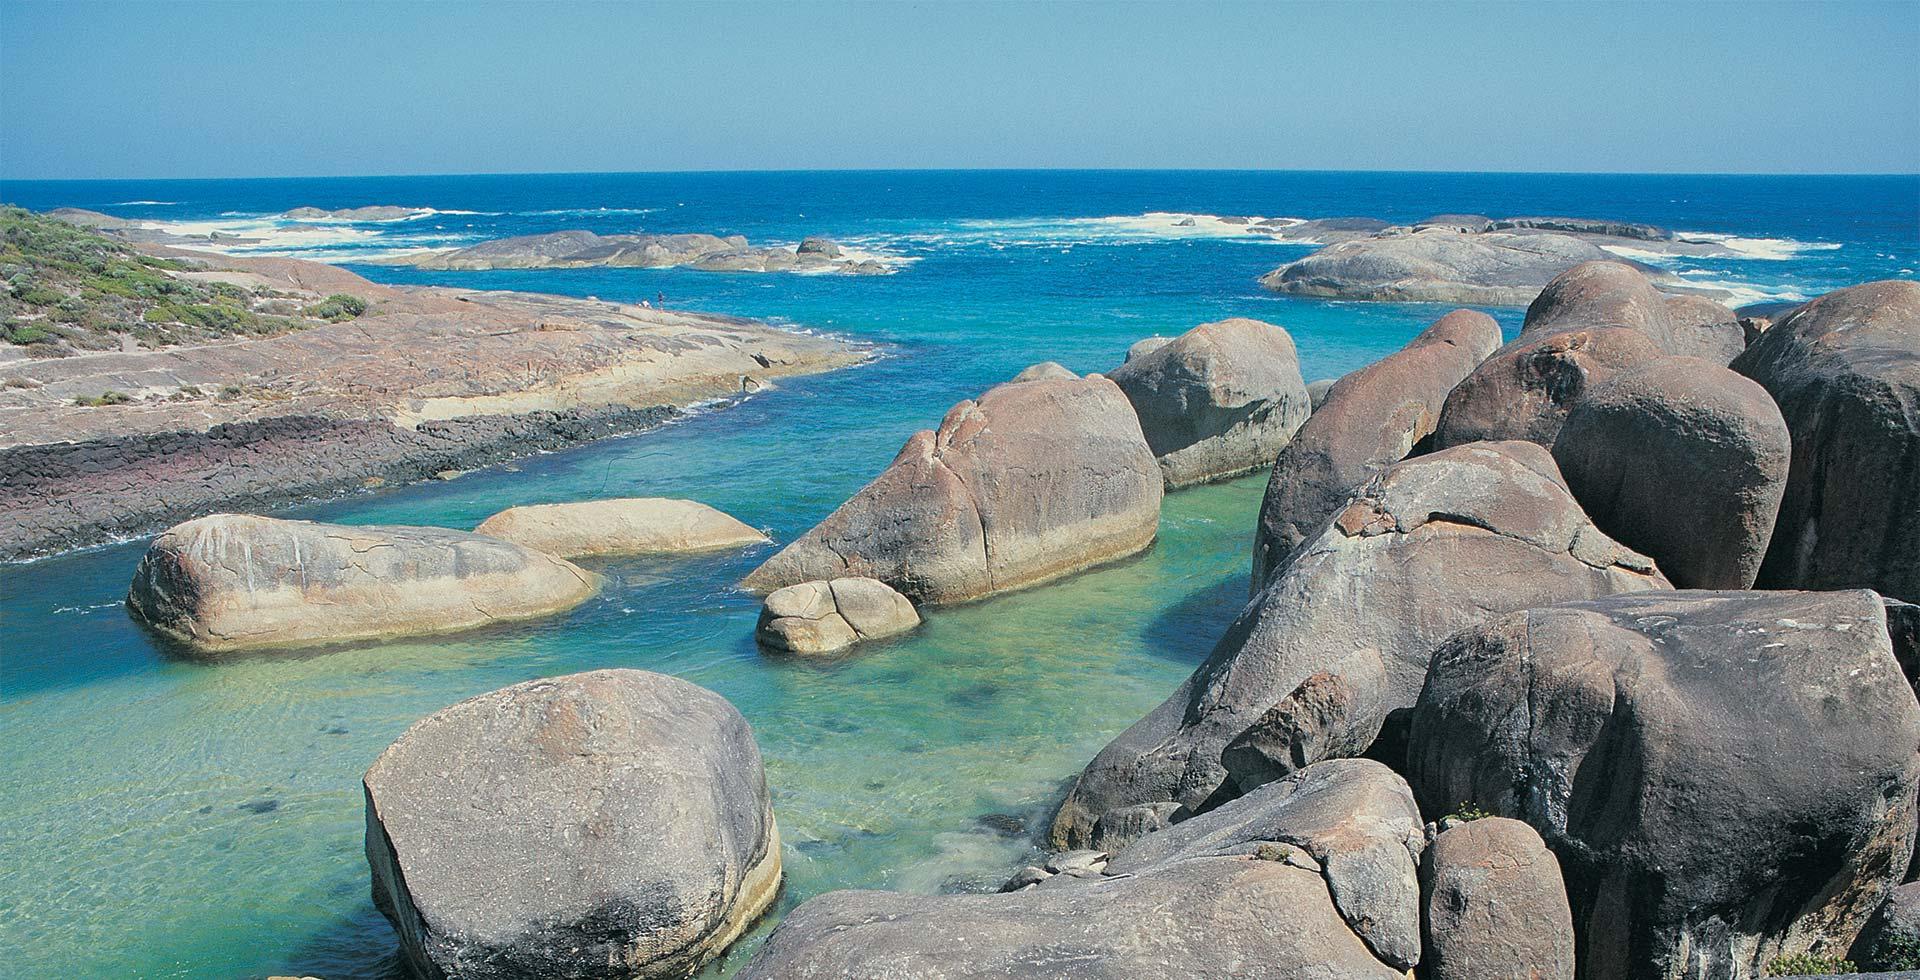 Enjoy the incredible Elephant Rocks at William Bay, Denmark